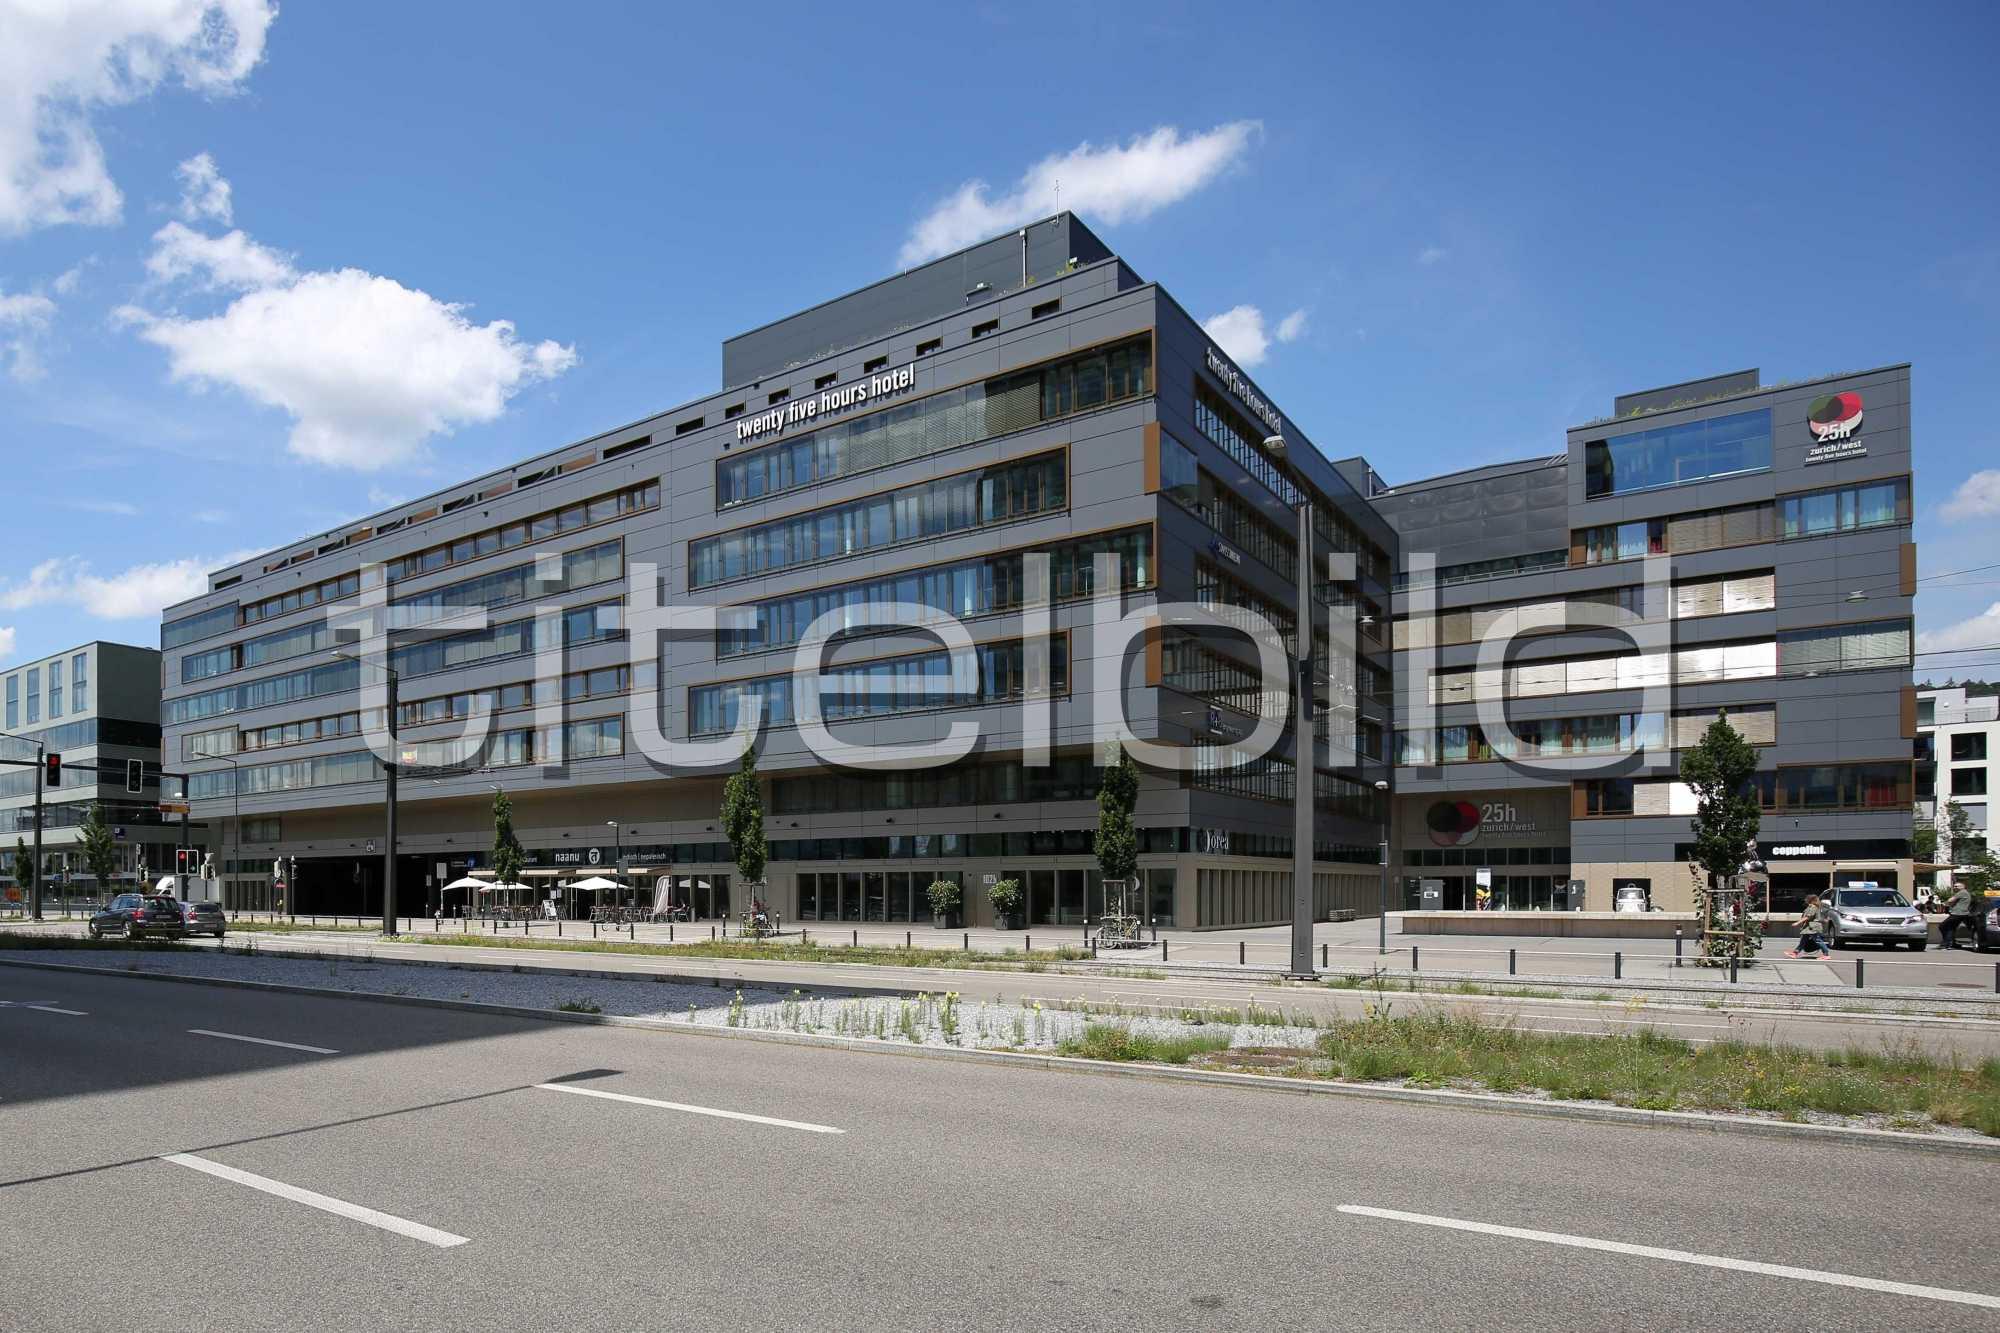 Projektbild-Nr. 0: HardturmPark Baufeld B 25hours Hotel